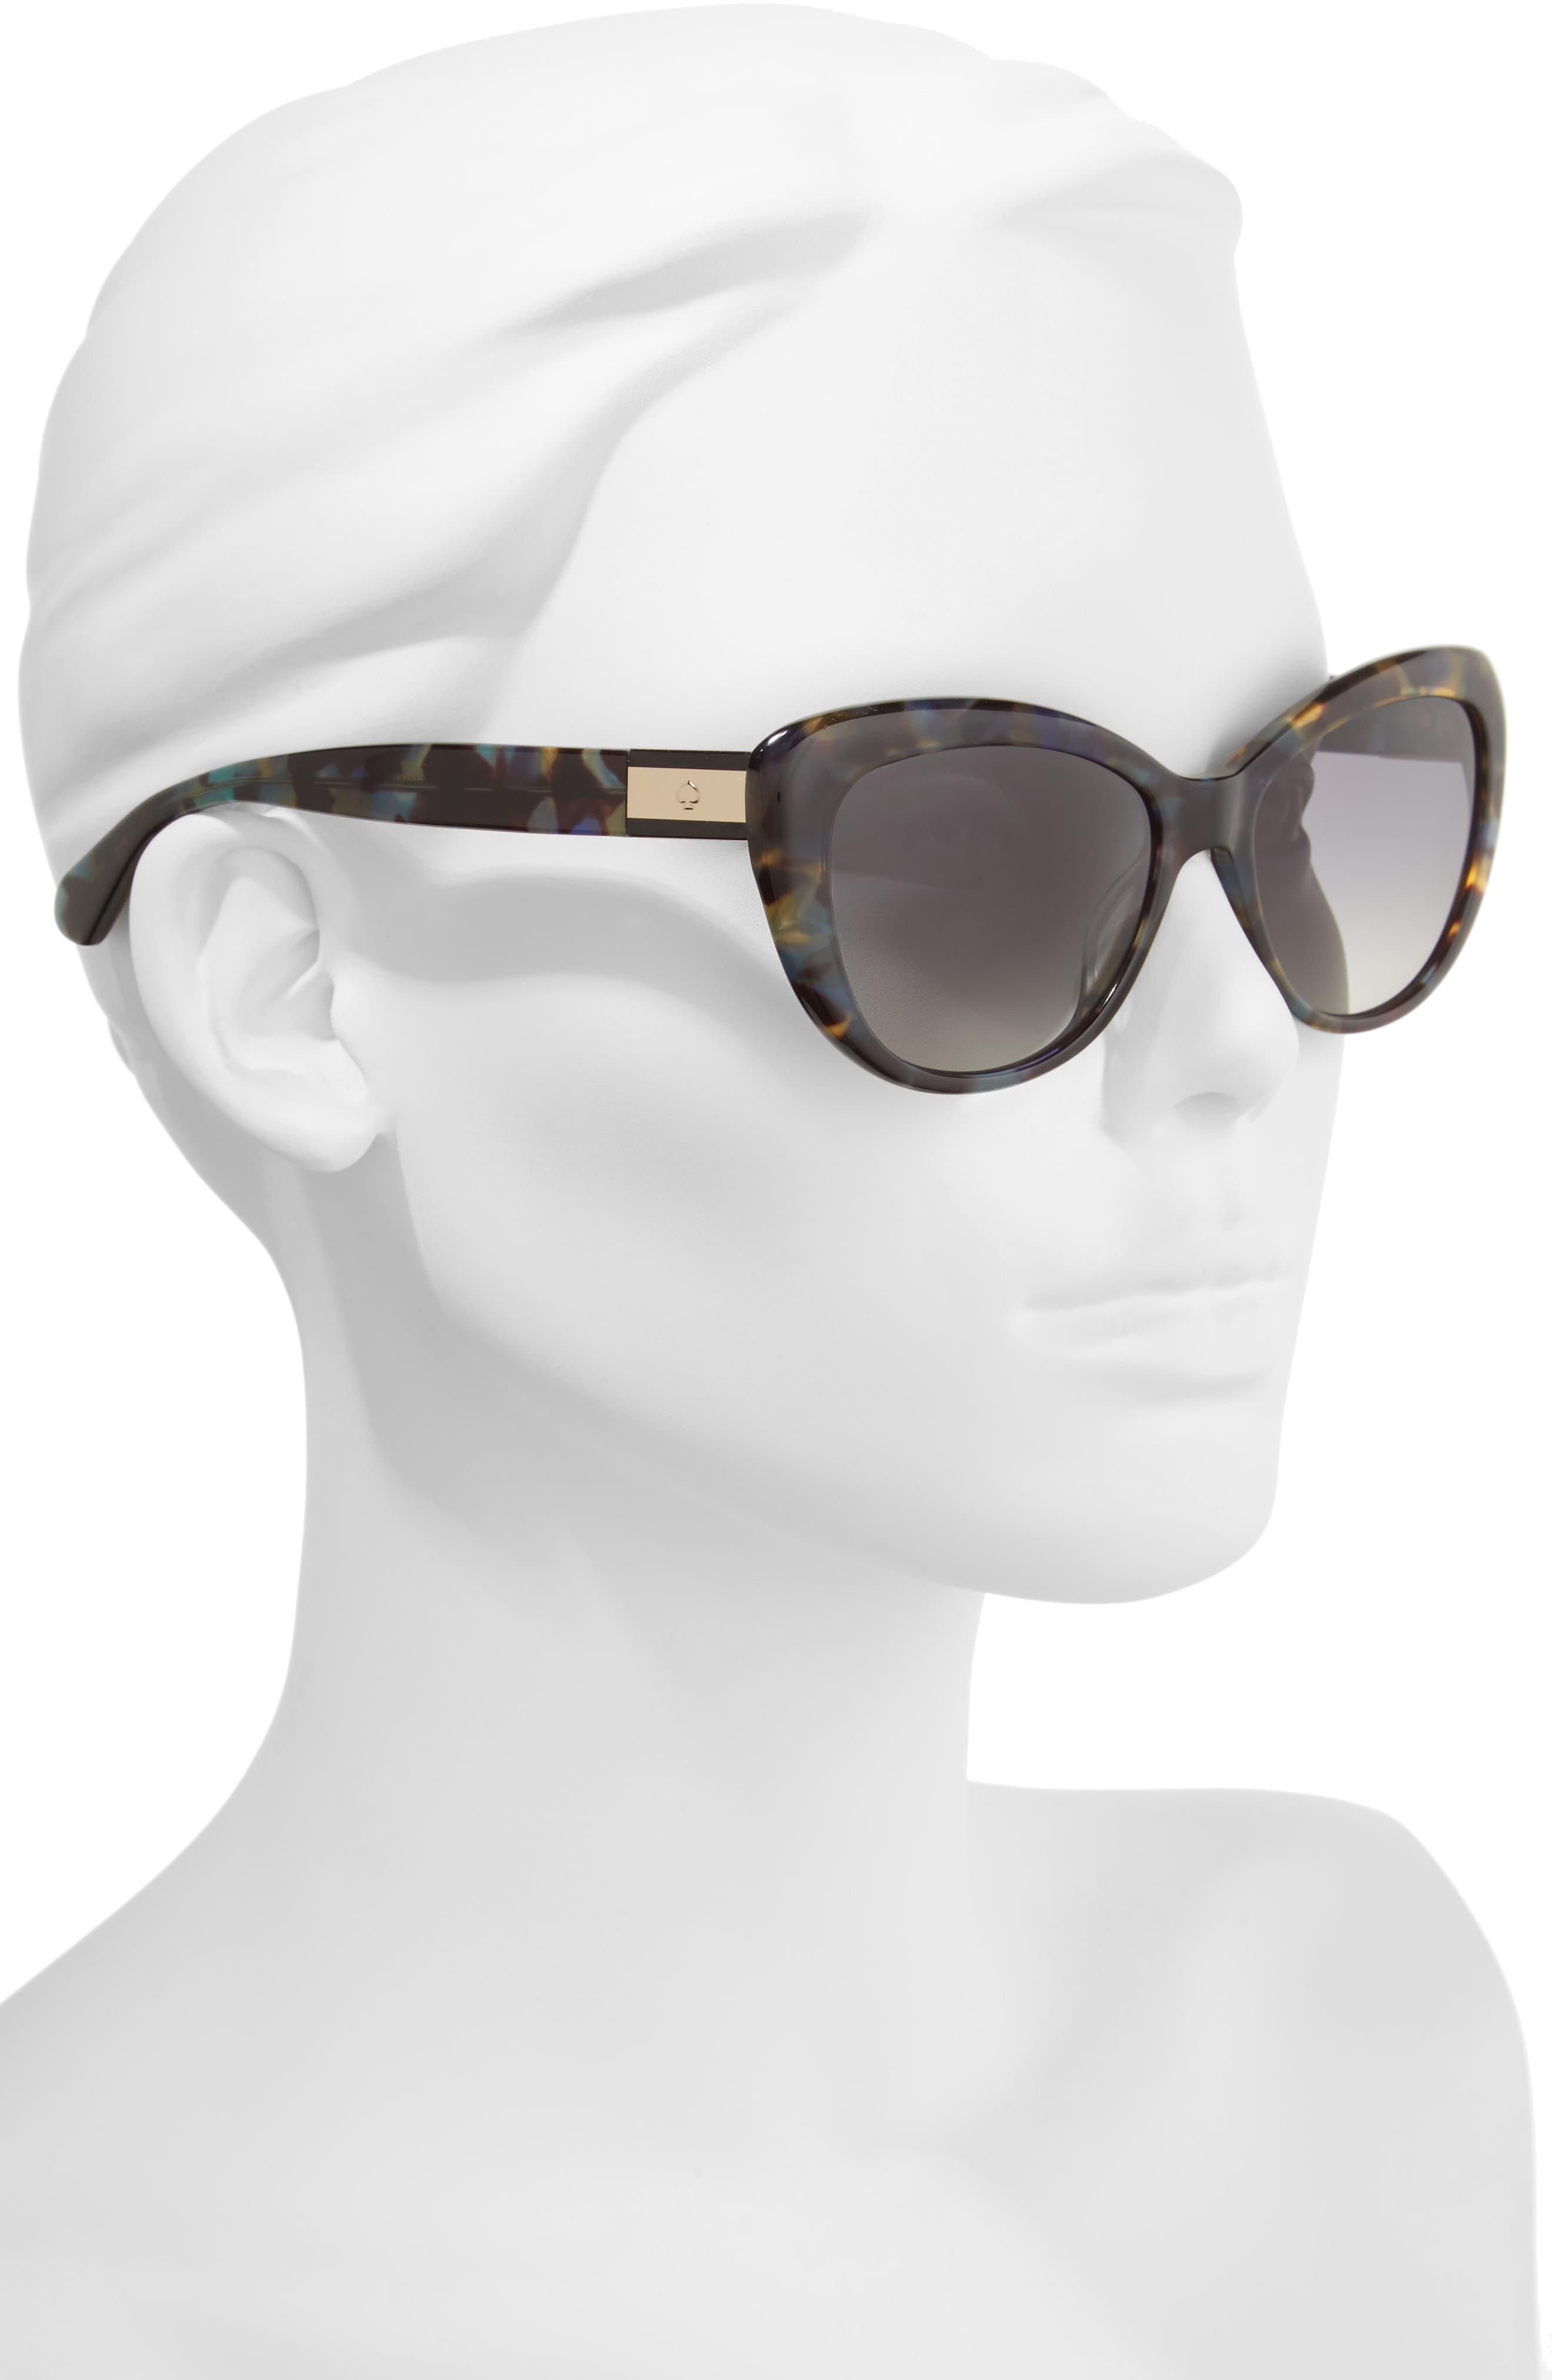 emmalyn 54mm polarized cat eye sunglasses,                             Alternate thumbnail 2, color,                             BLUE HAVANA